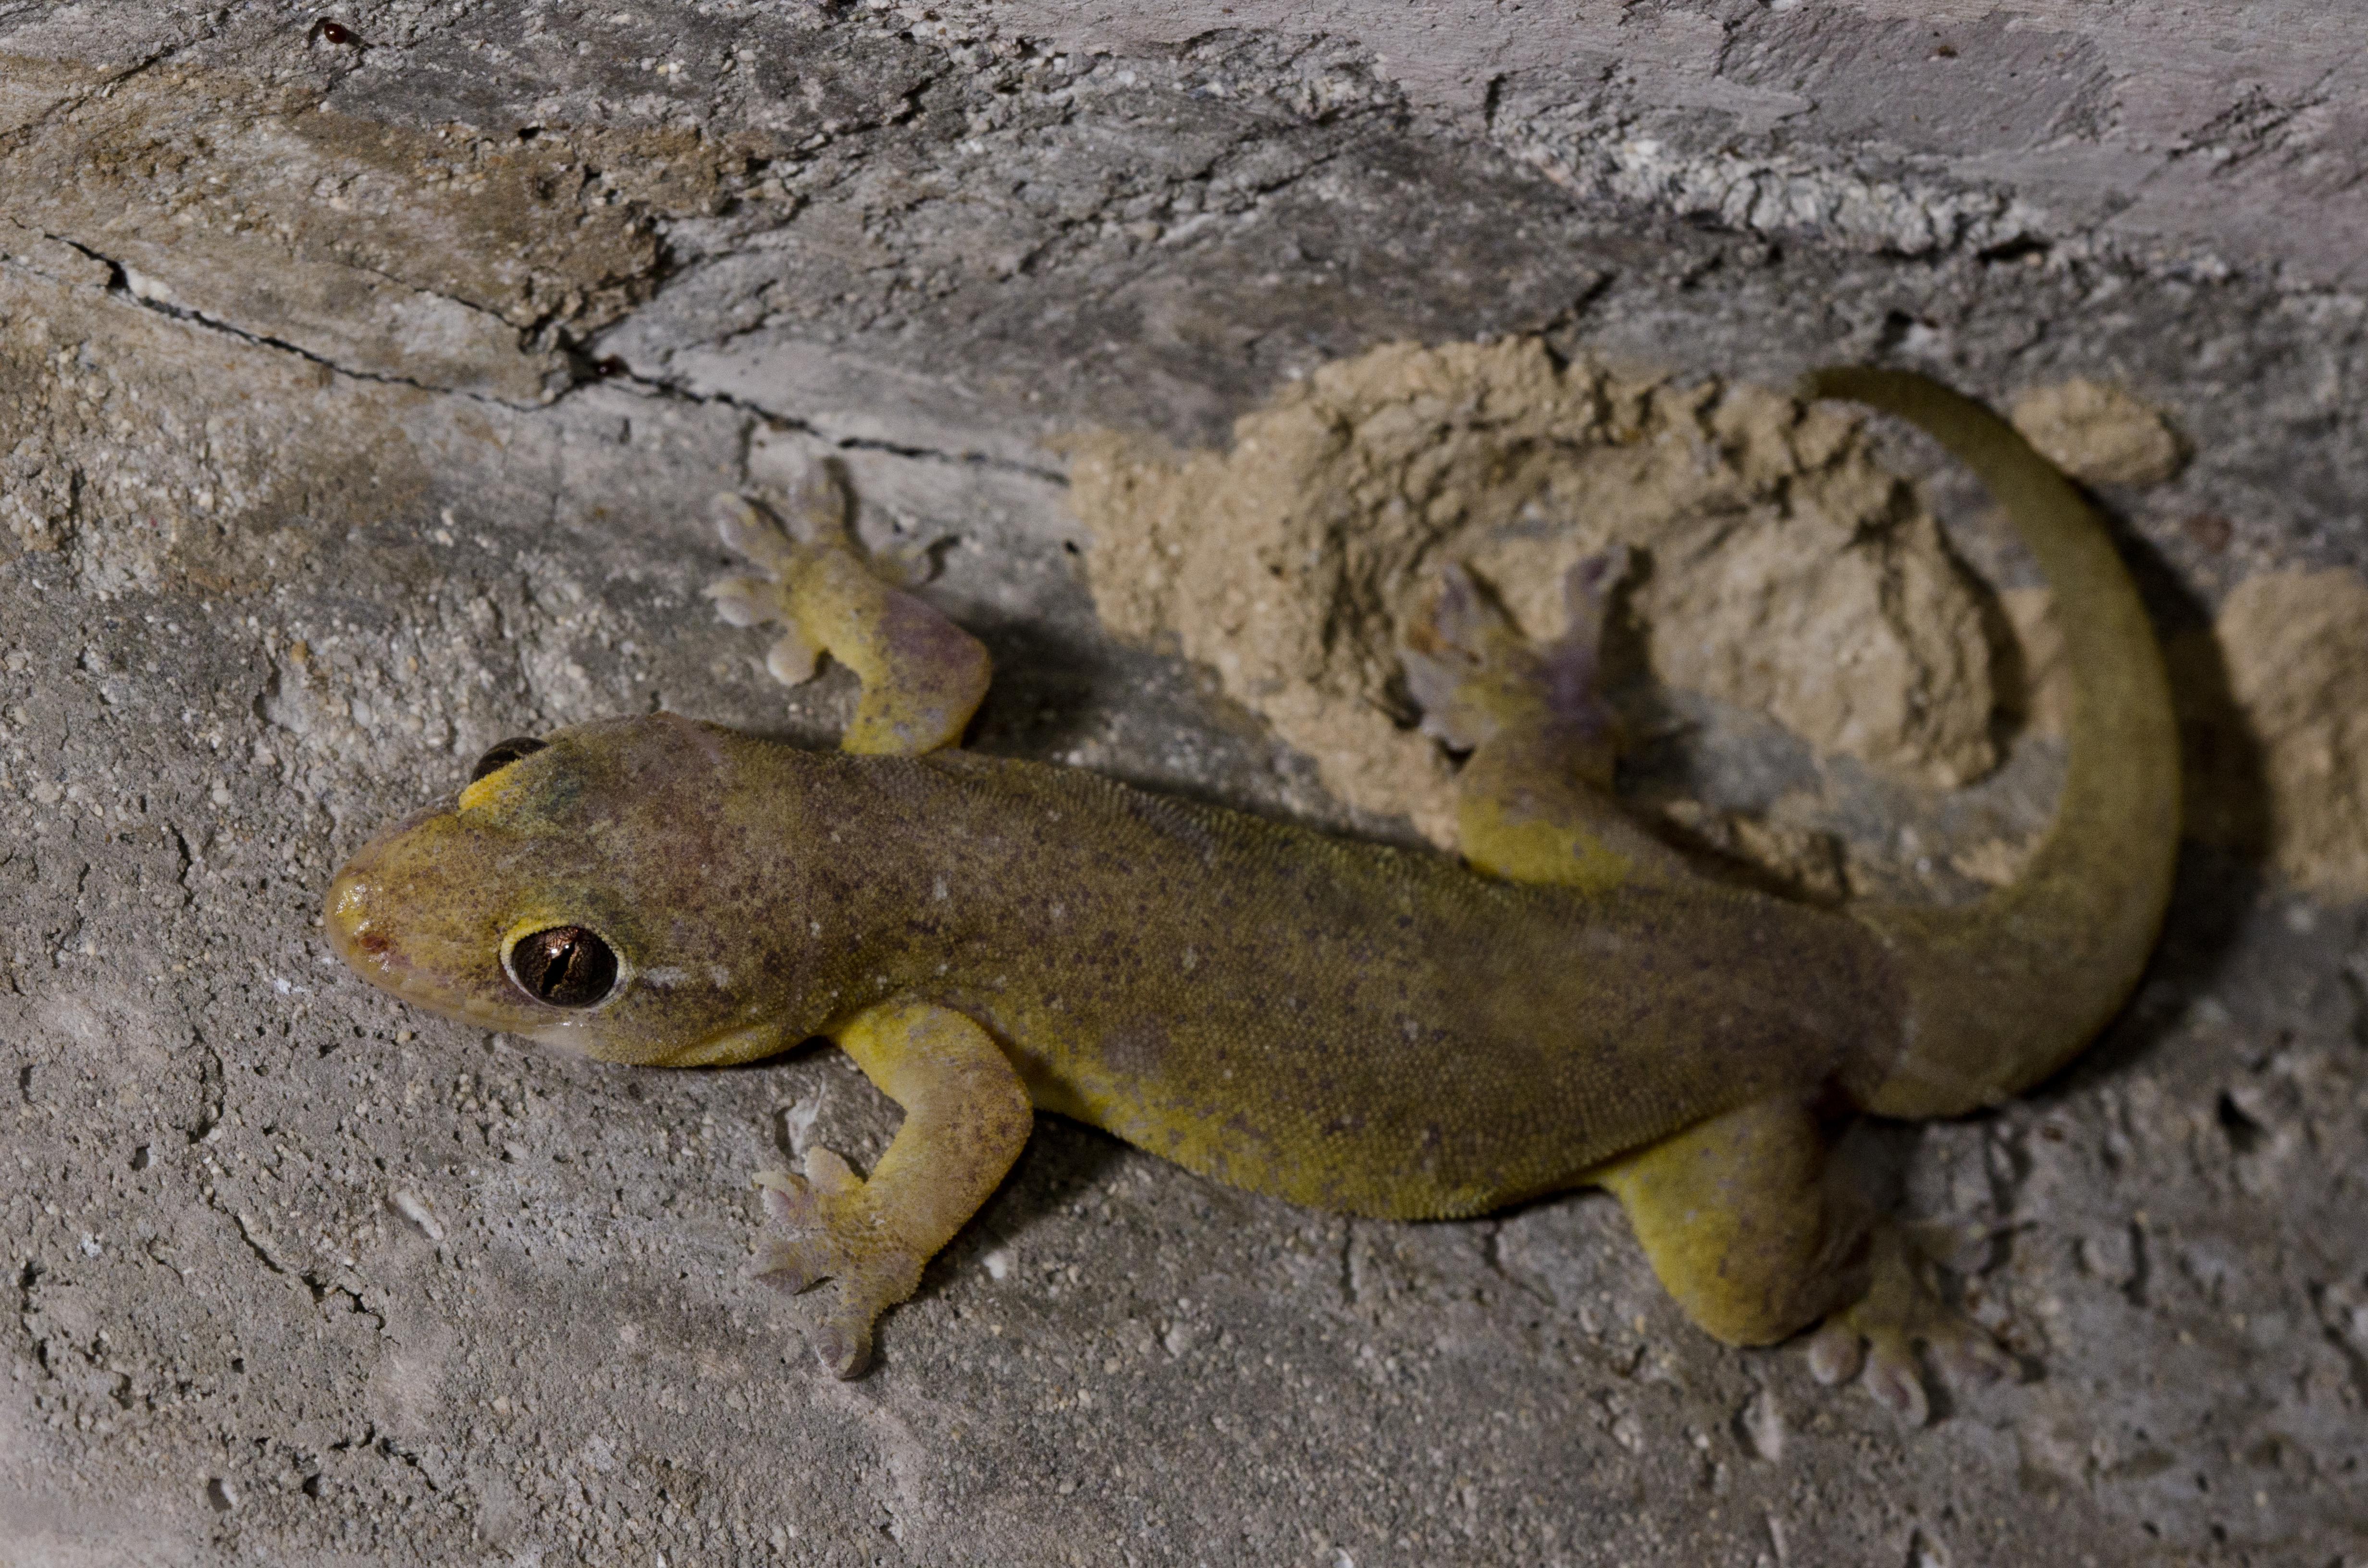 Image of Mutilating Gecko